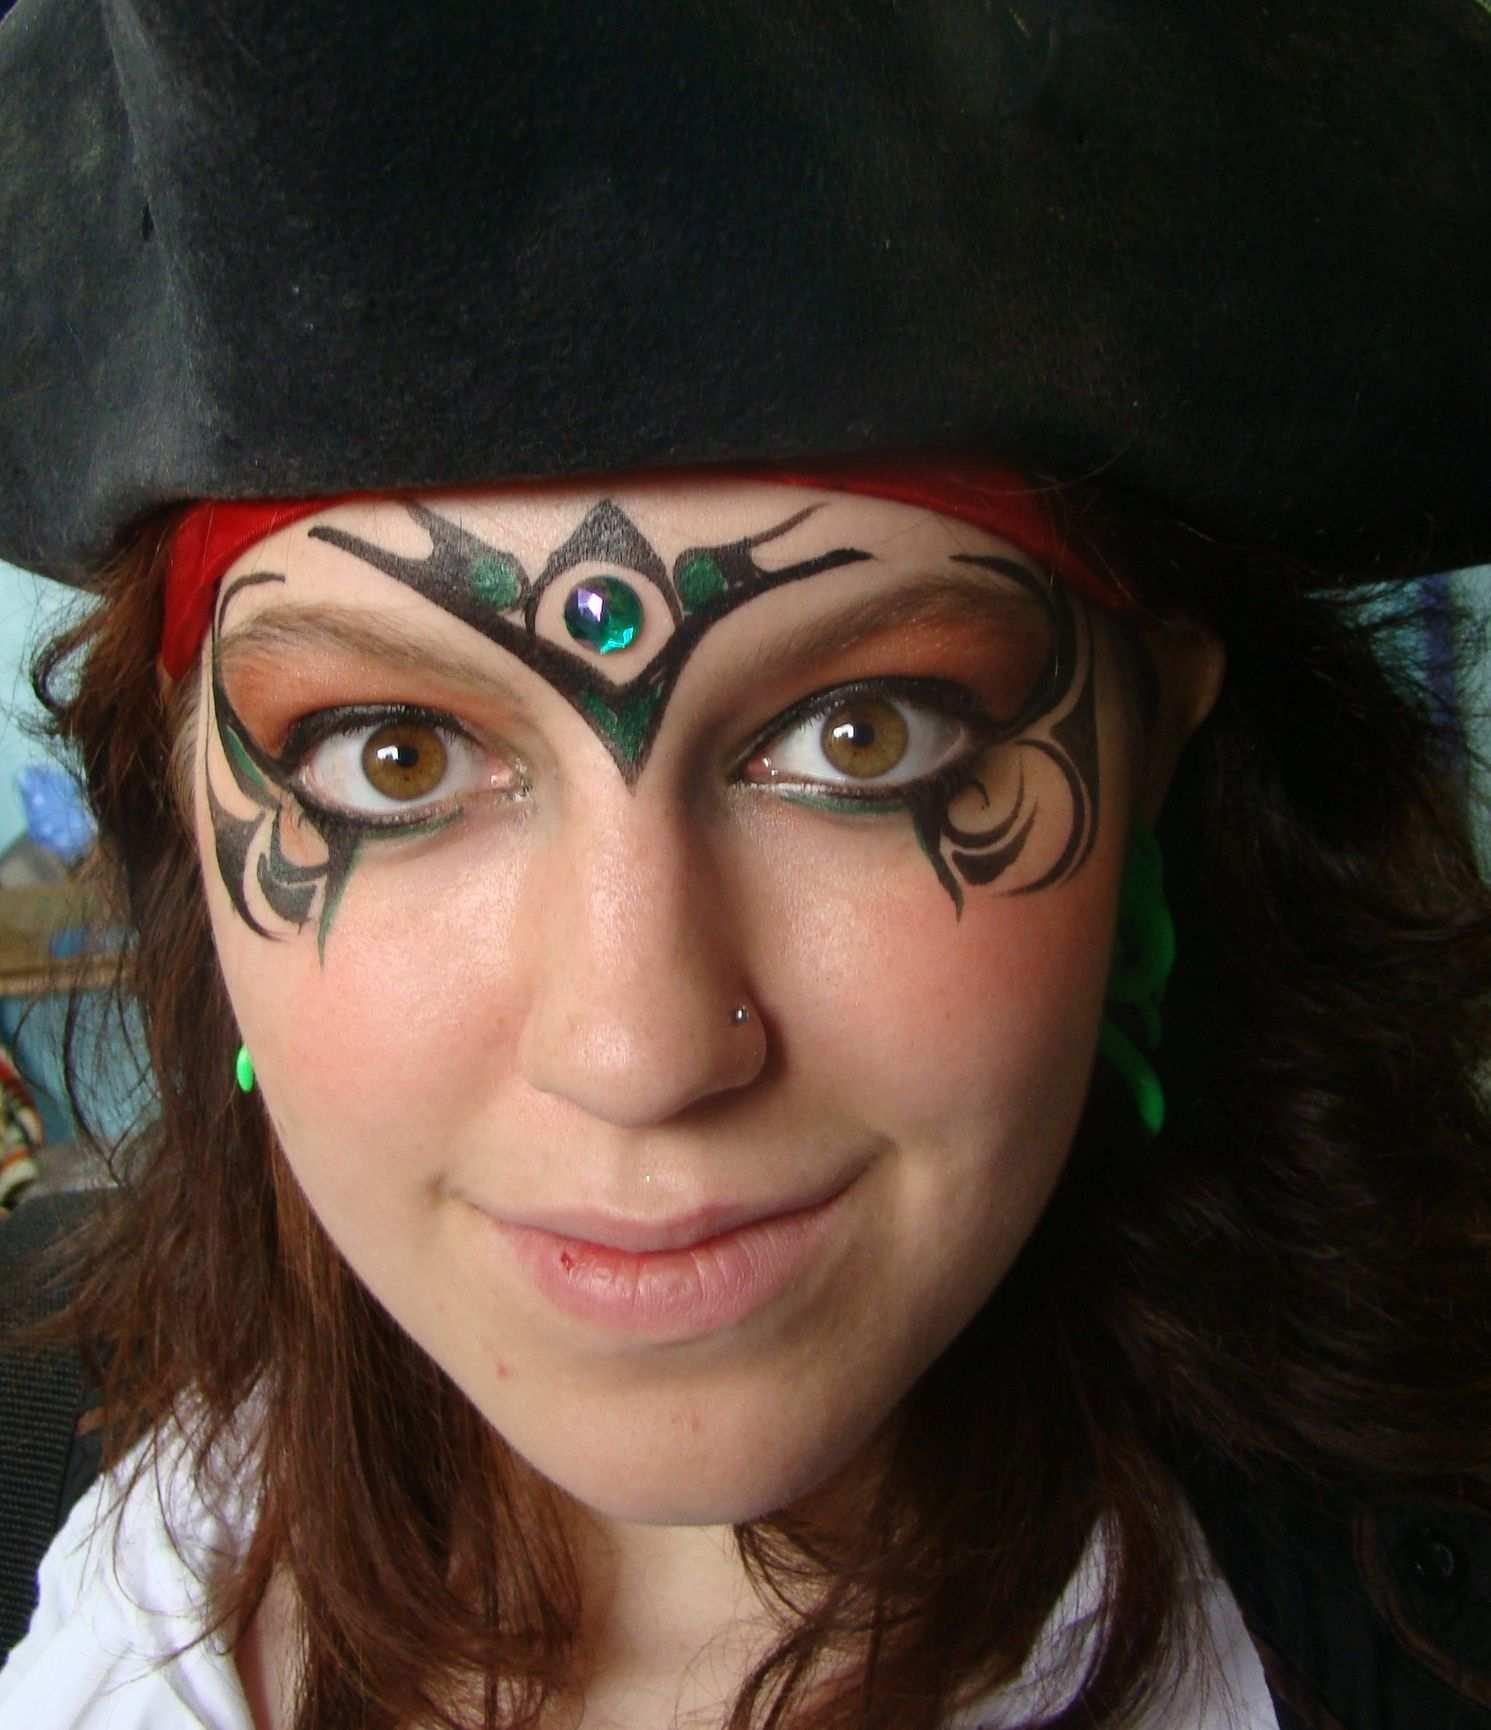 Pirate Girl Pirat Schminken Pirat Schminken Kinder Piratenkostum Diy